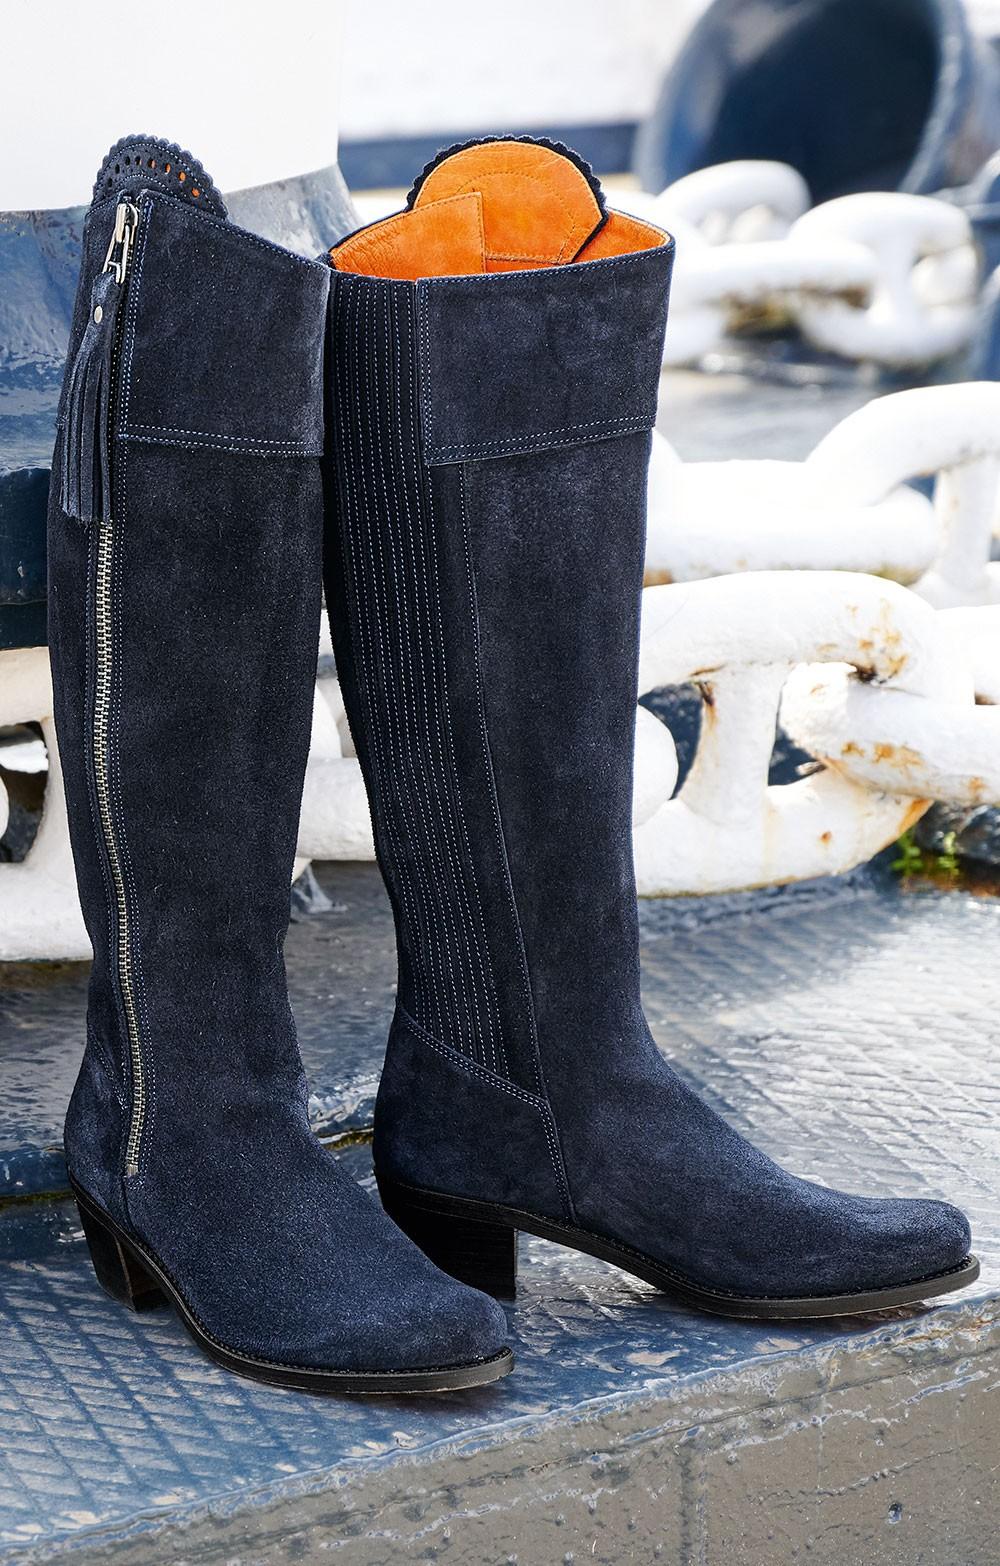 Ladies Suede Riding Boot - House of Bruar